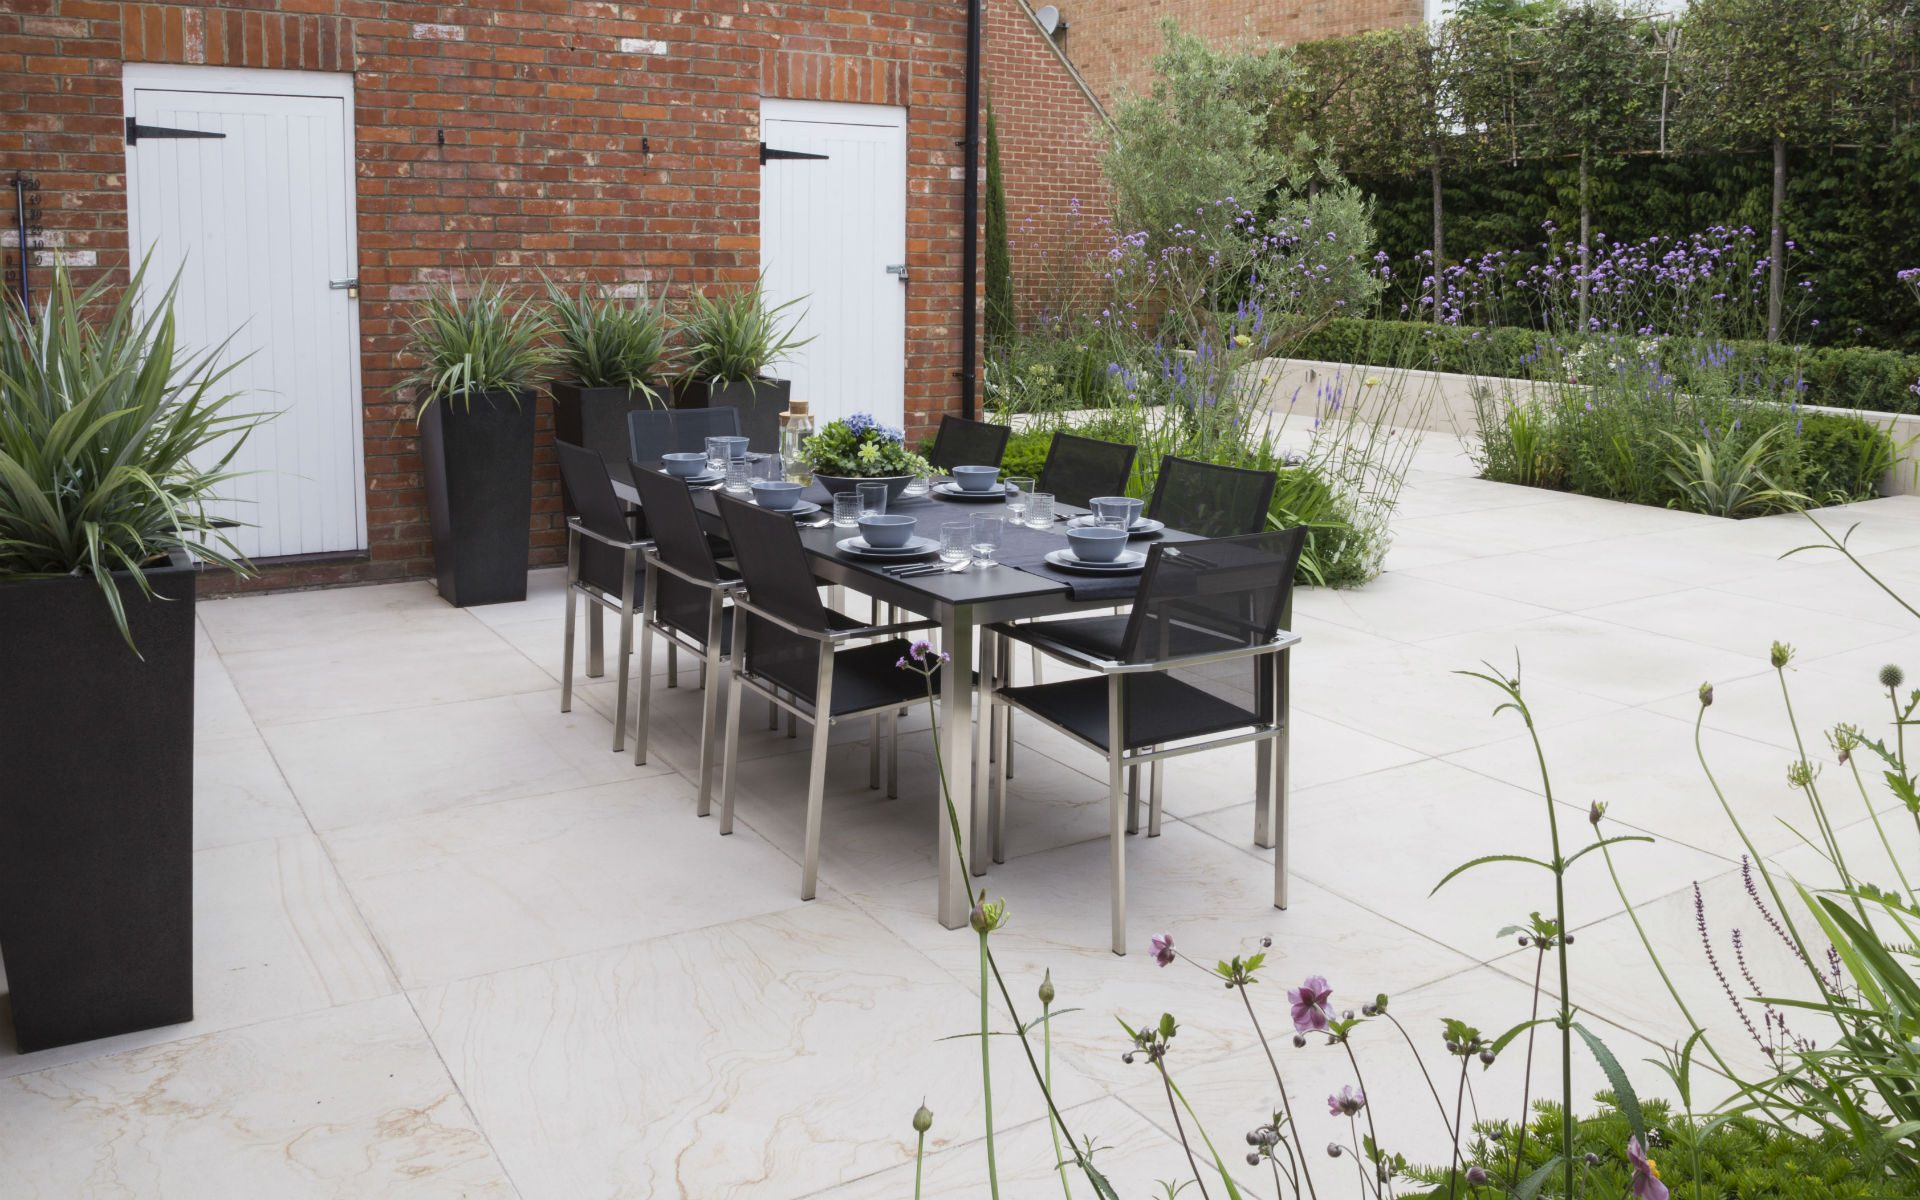 Portfolio Contemporary Living Garden and Courtyard Shenfield Essex Dining Area